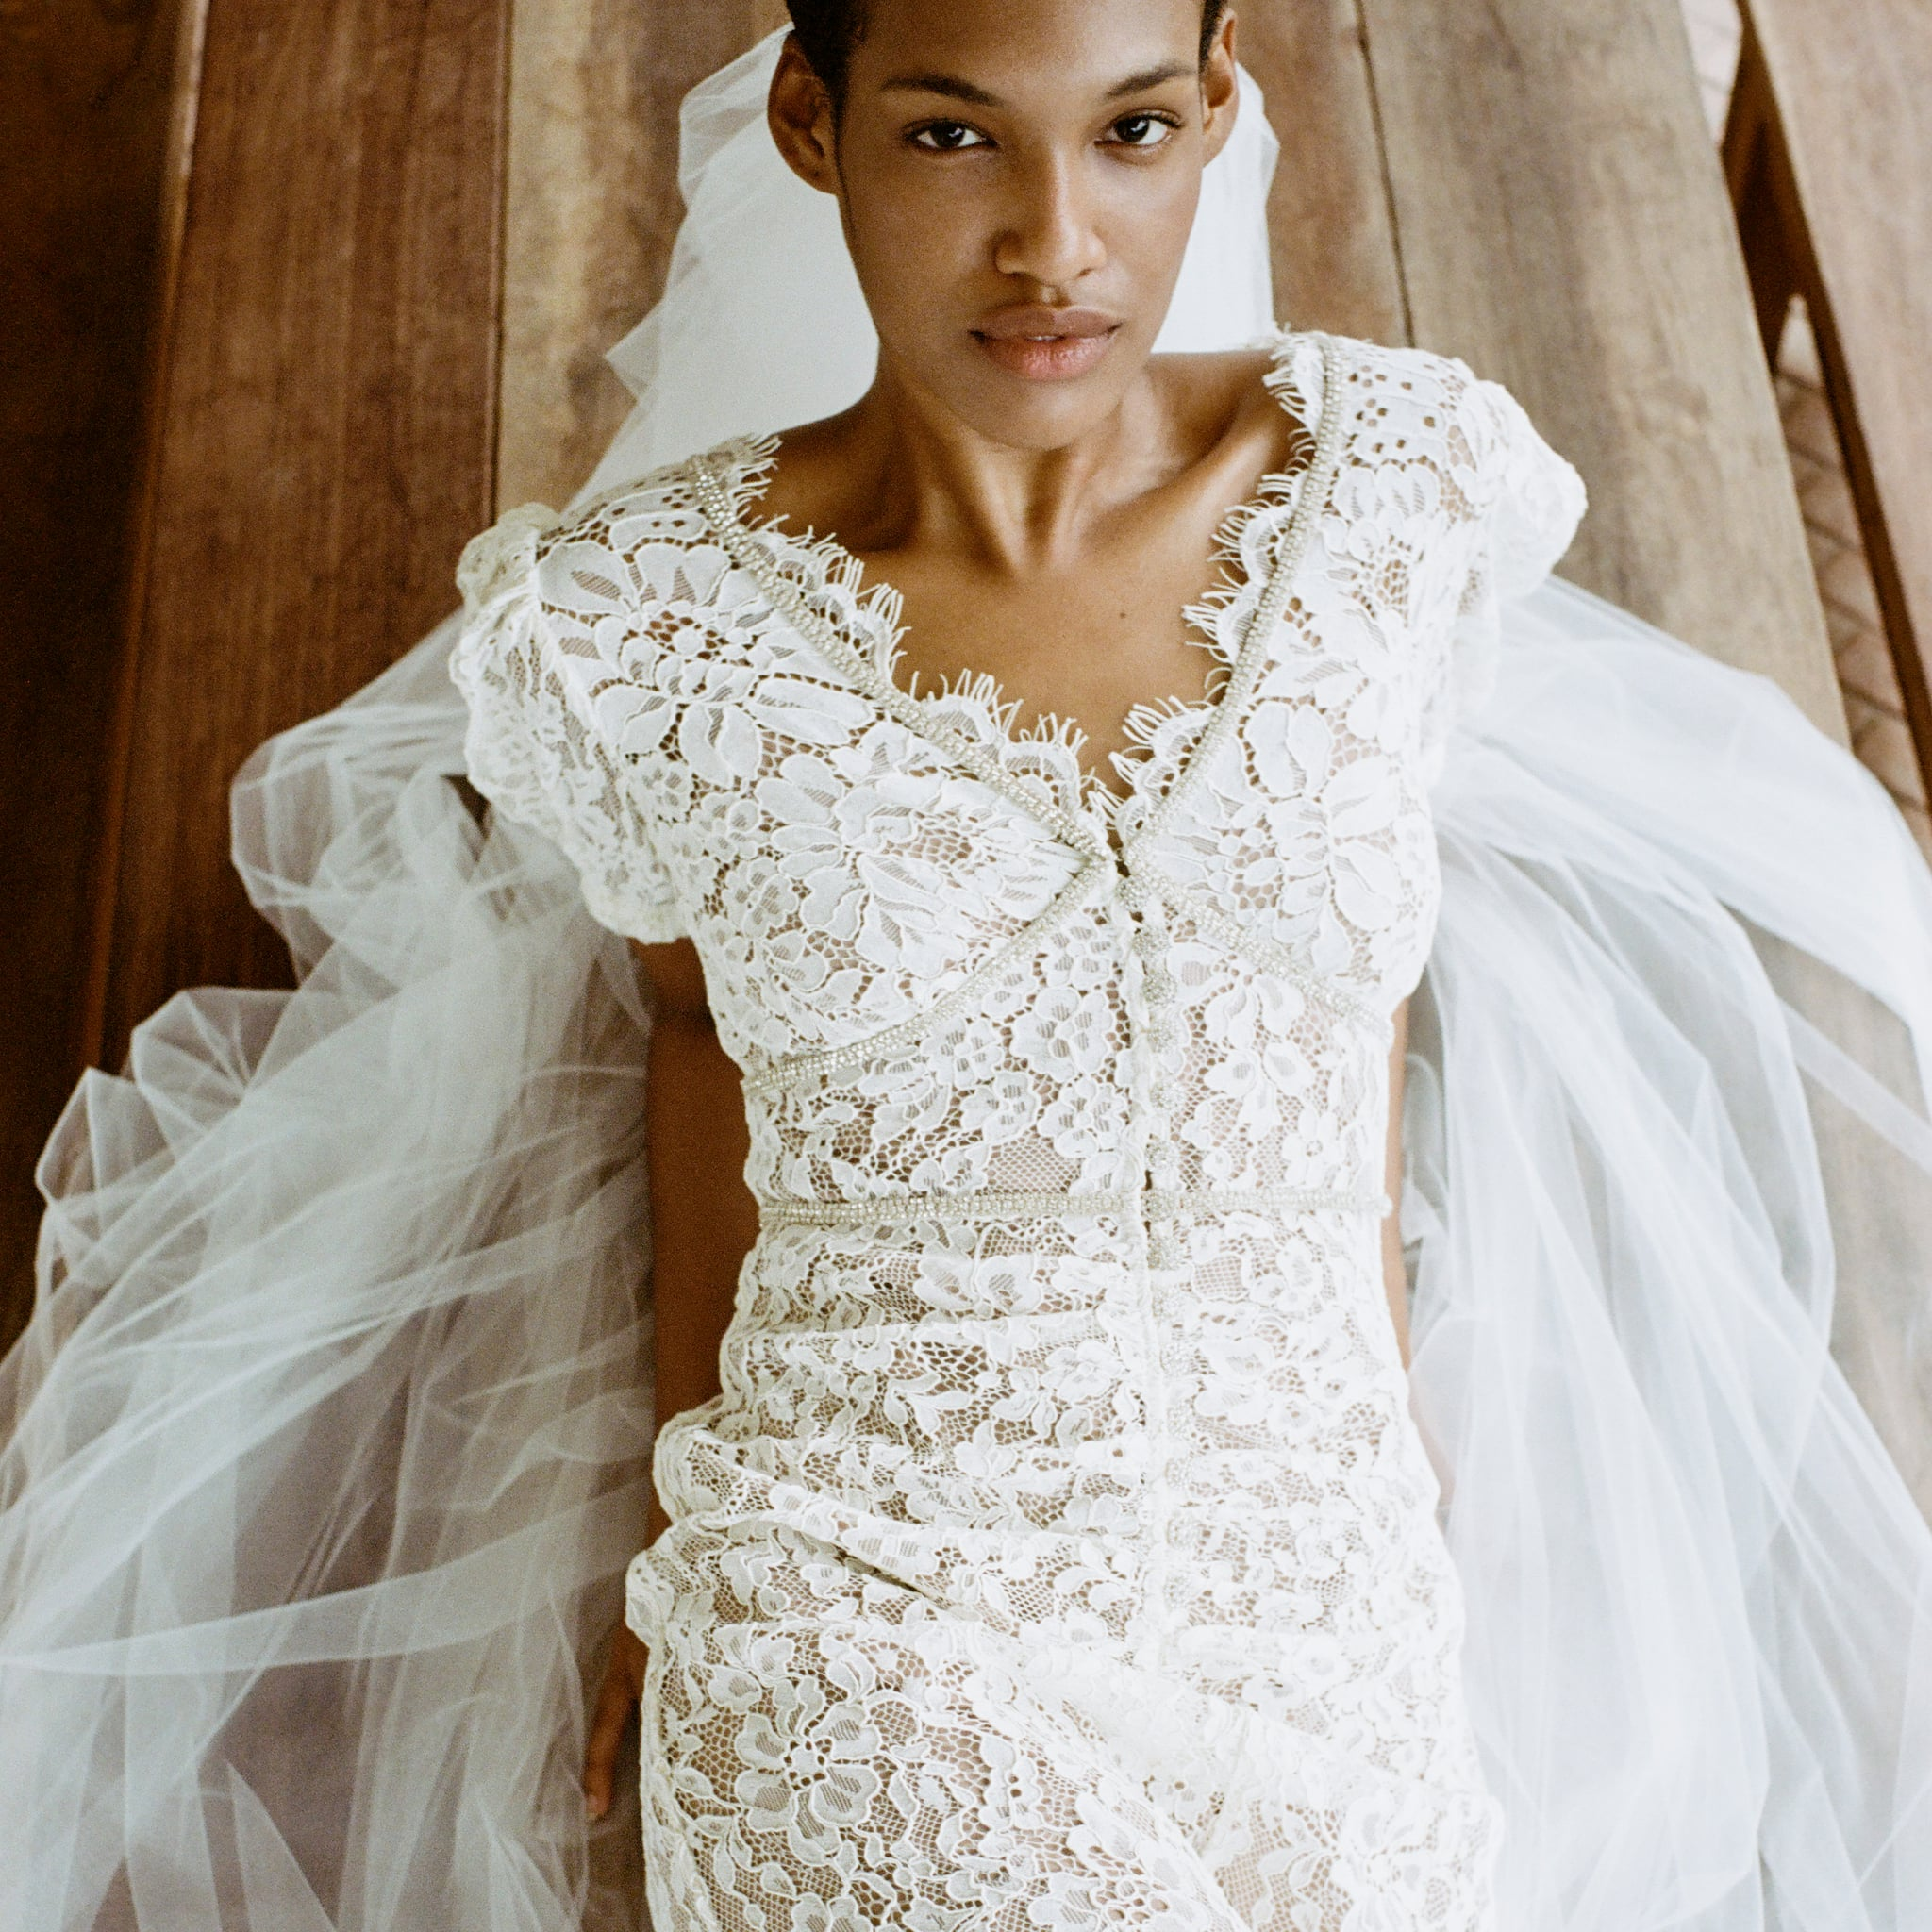 Affordable Wedding Dress And Bridal Gown Brands In The Uk Popsugar Fashion Uk